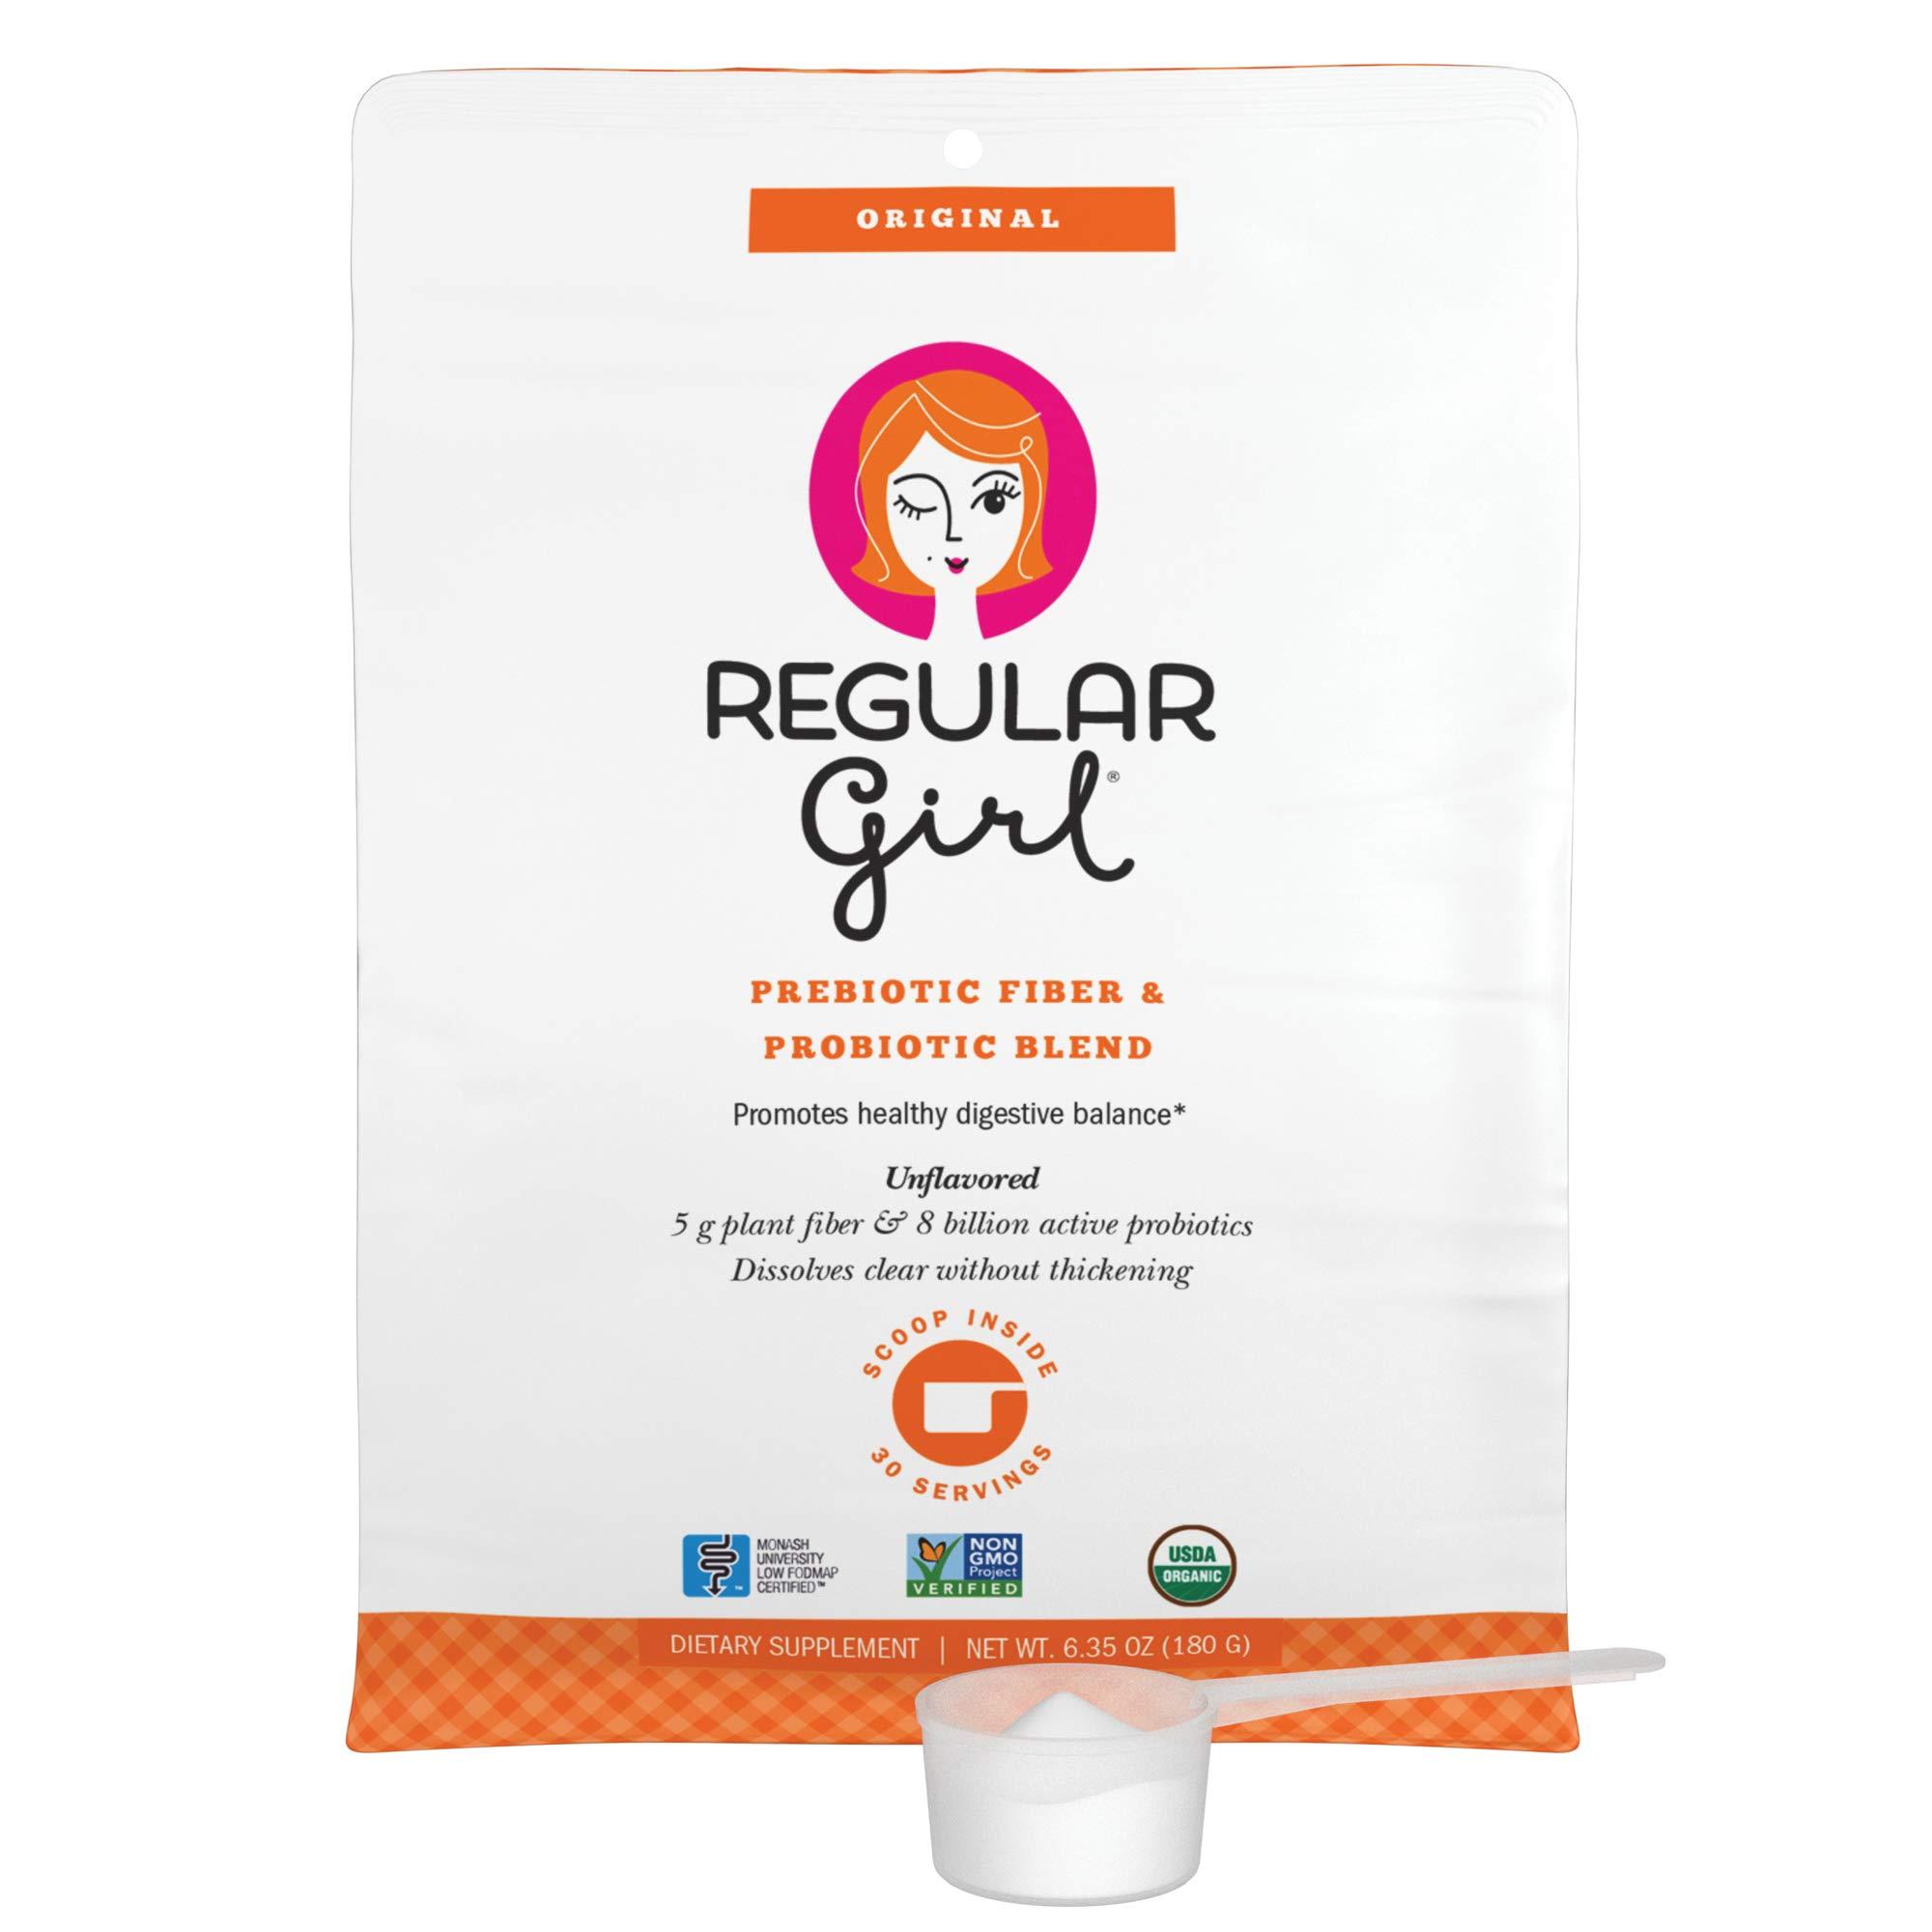 Regular Girl - Organic Powder, Low FODMAP Prebiotic Guar Fiber and Probiotic Support for Comfortable Digestion, 30 Servings by Regular Girl